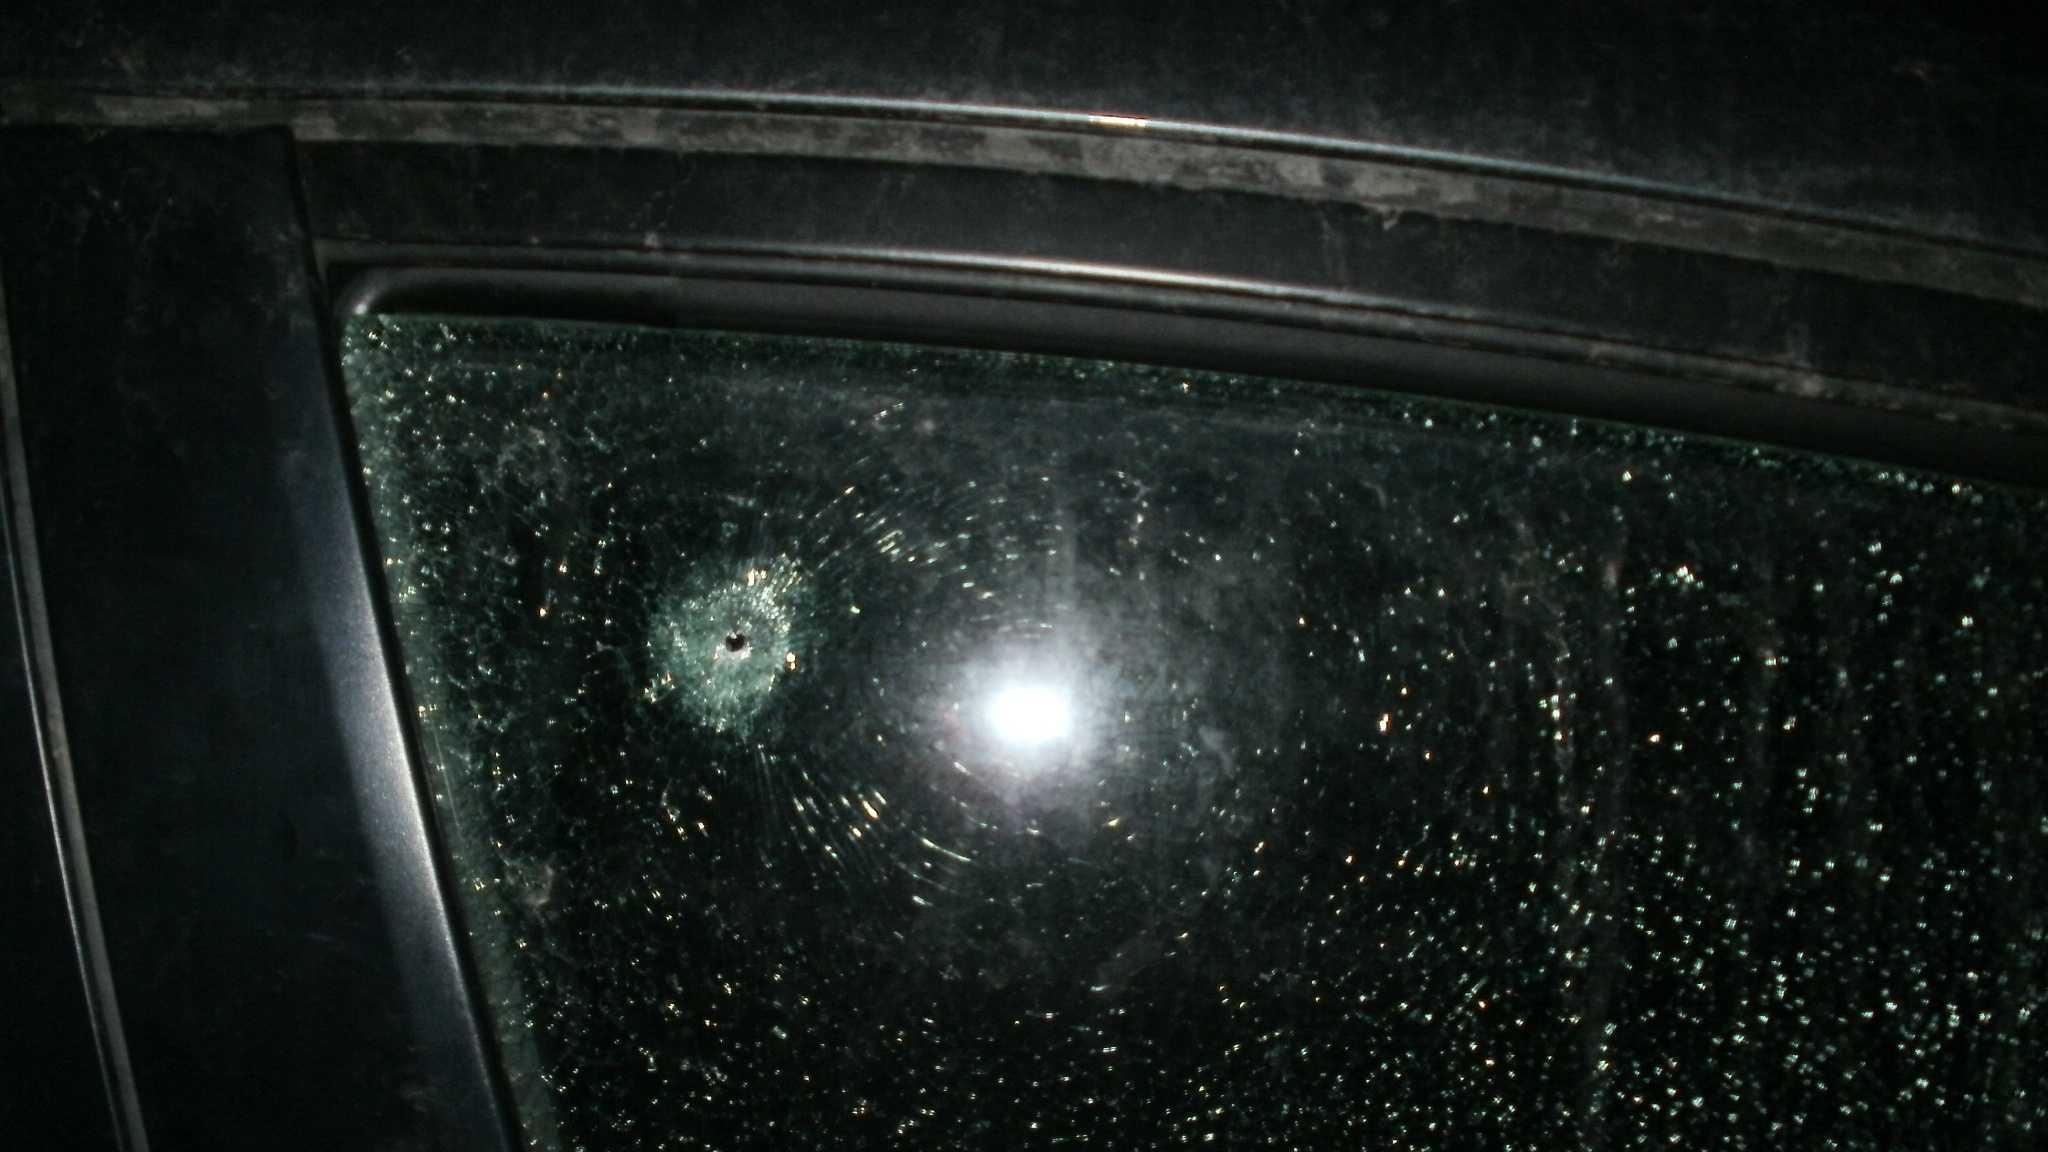 011413 Car windows shot out in Georgia - img